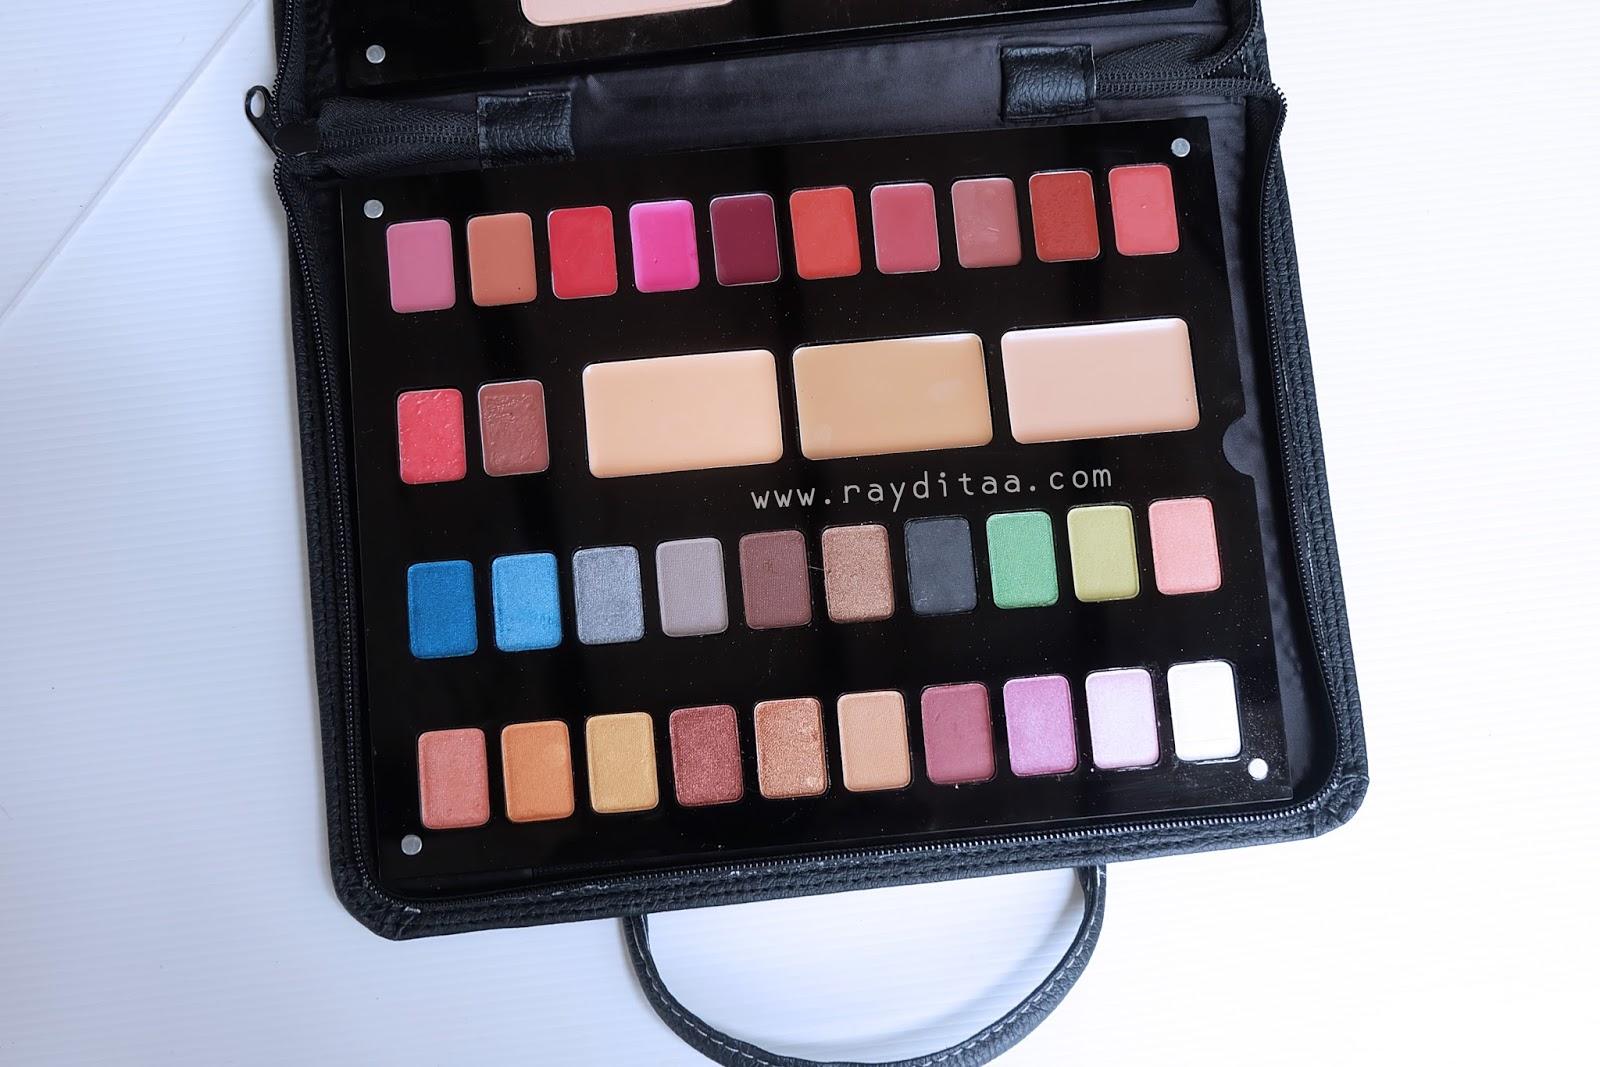 Review Inez Cosmetics Palette With Luxury Pack Elusive Correcting Cream Vivid Di Yg Bagian Atas Selain Ada Eyeshadow Tuh Dia Juga Dan Lipstick Lipshine Nya